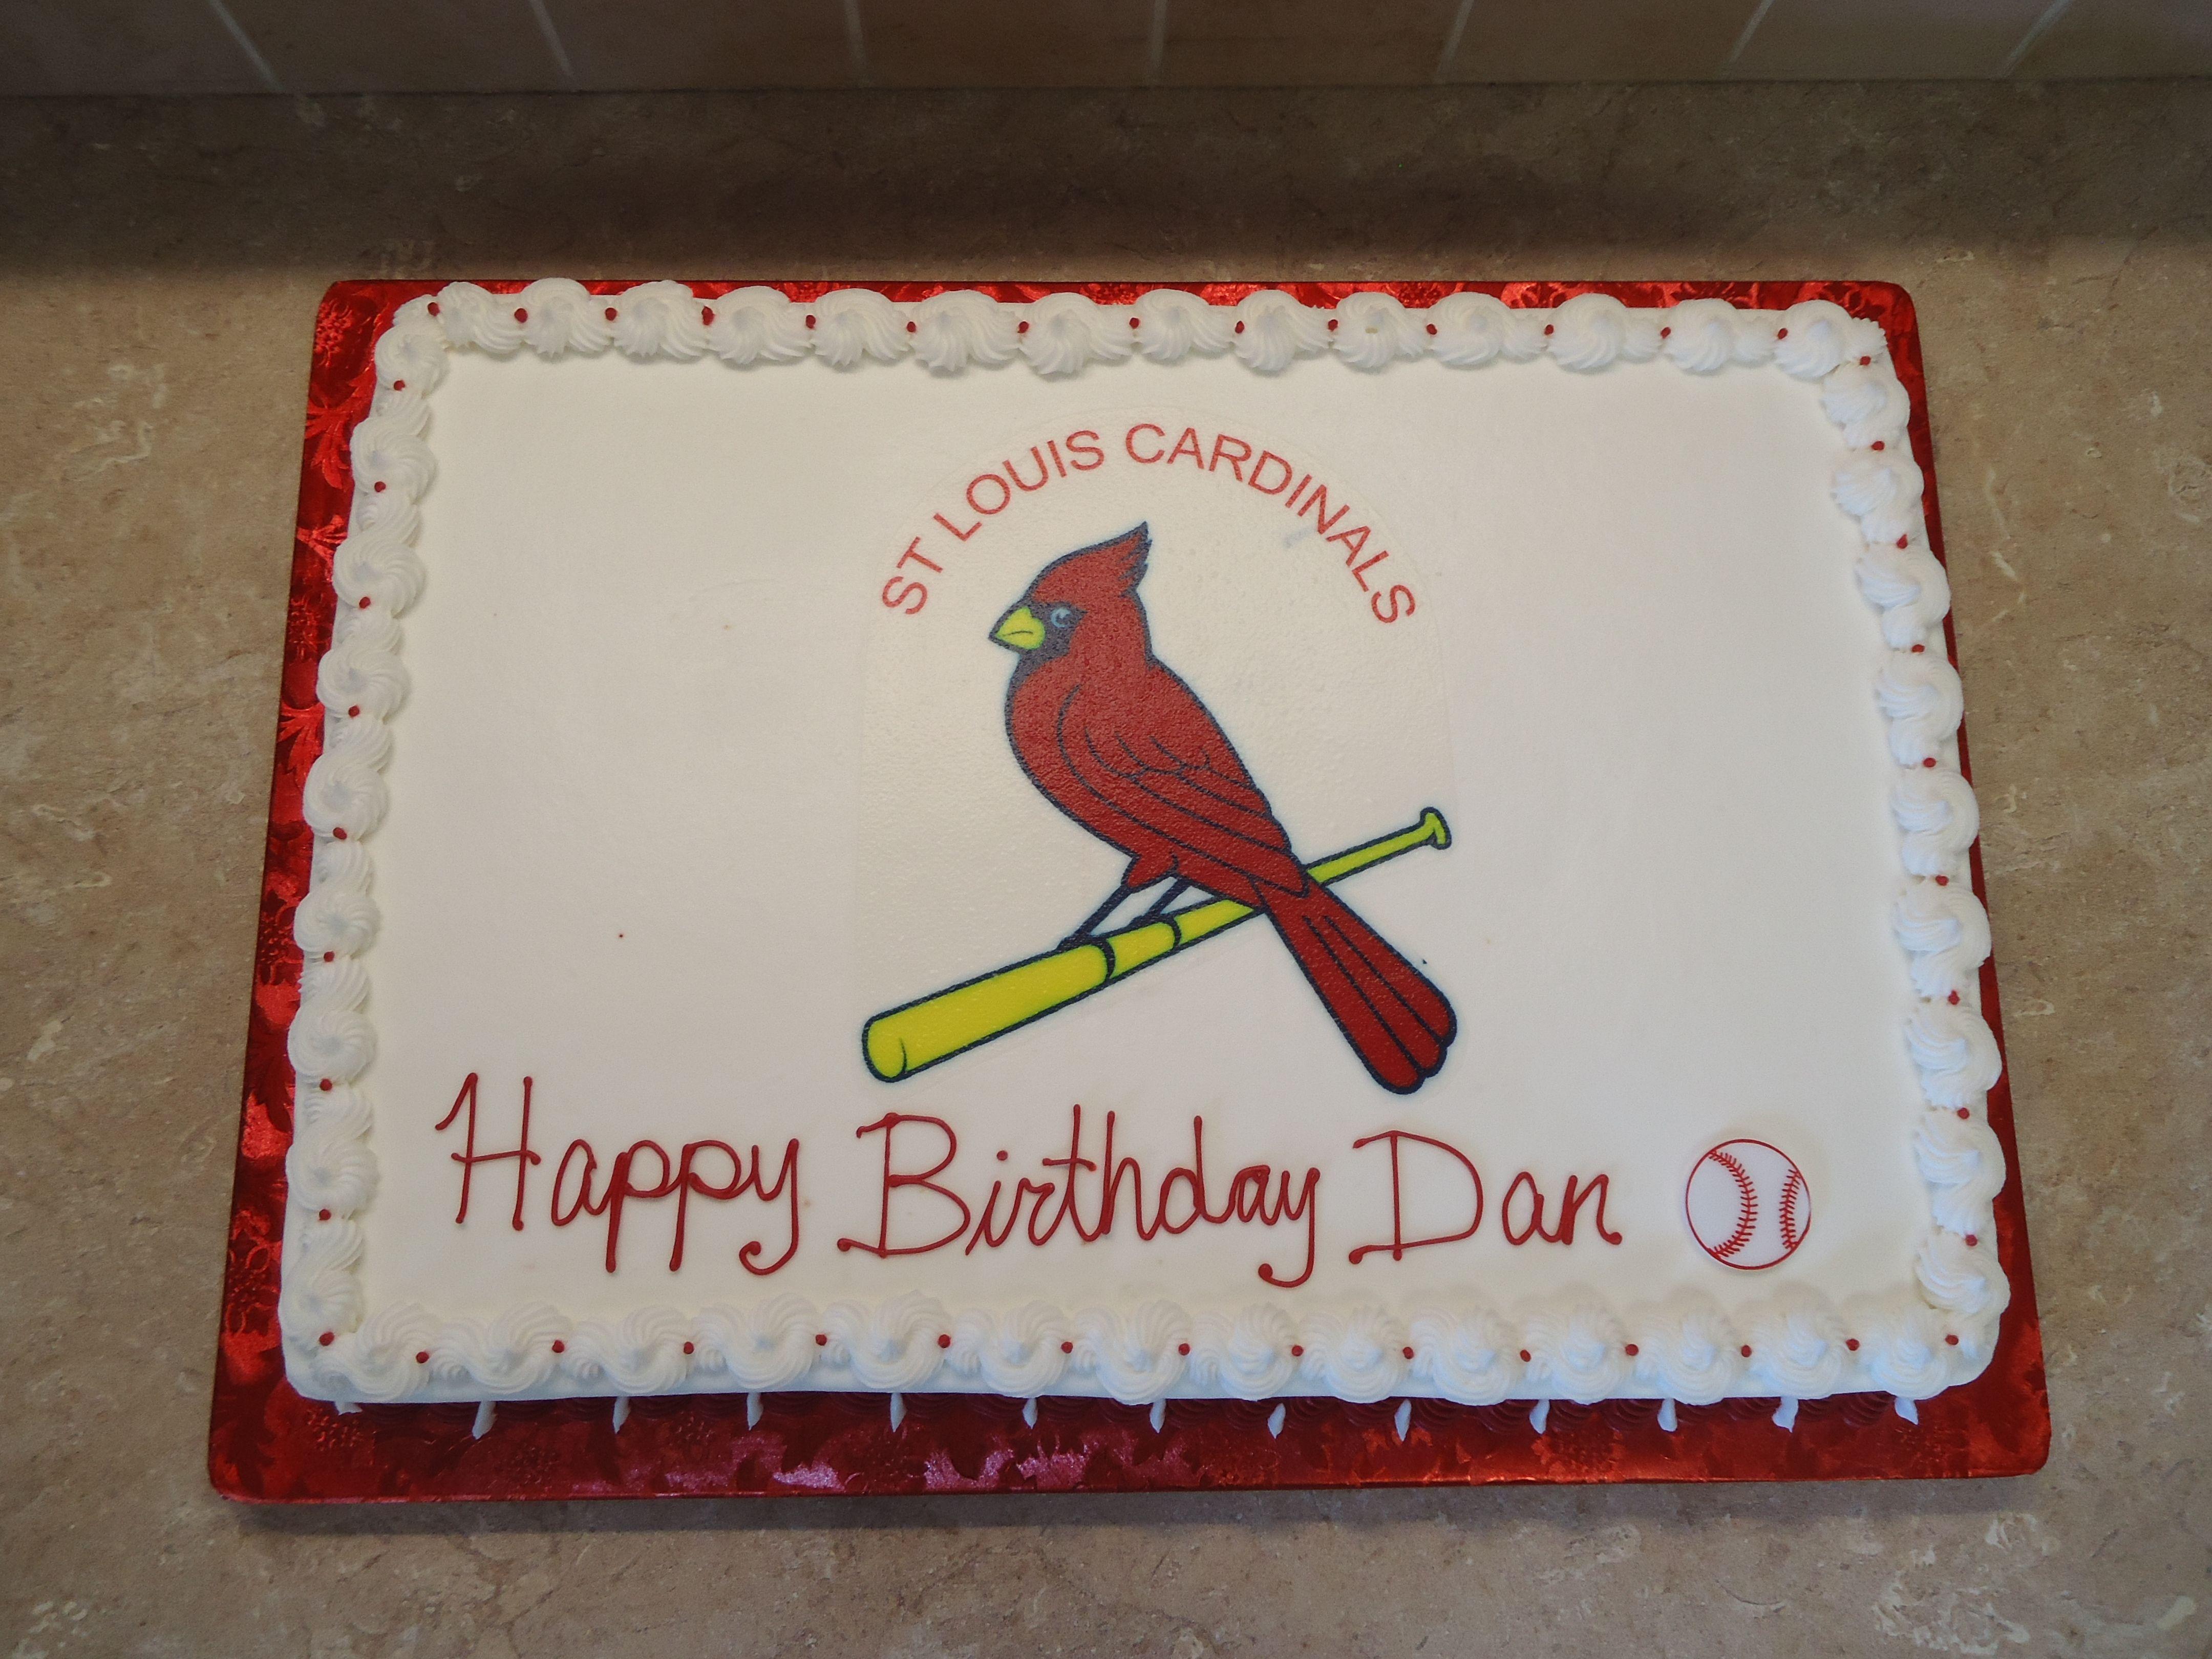 St Louis Cardinals Birthday Cake The St Louis Cardinals Was An